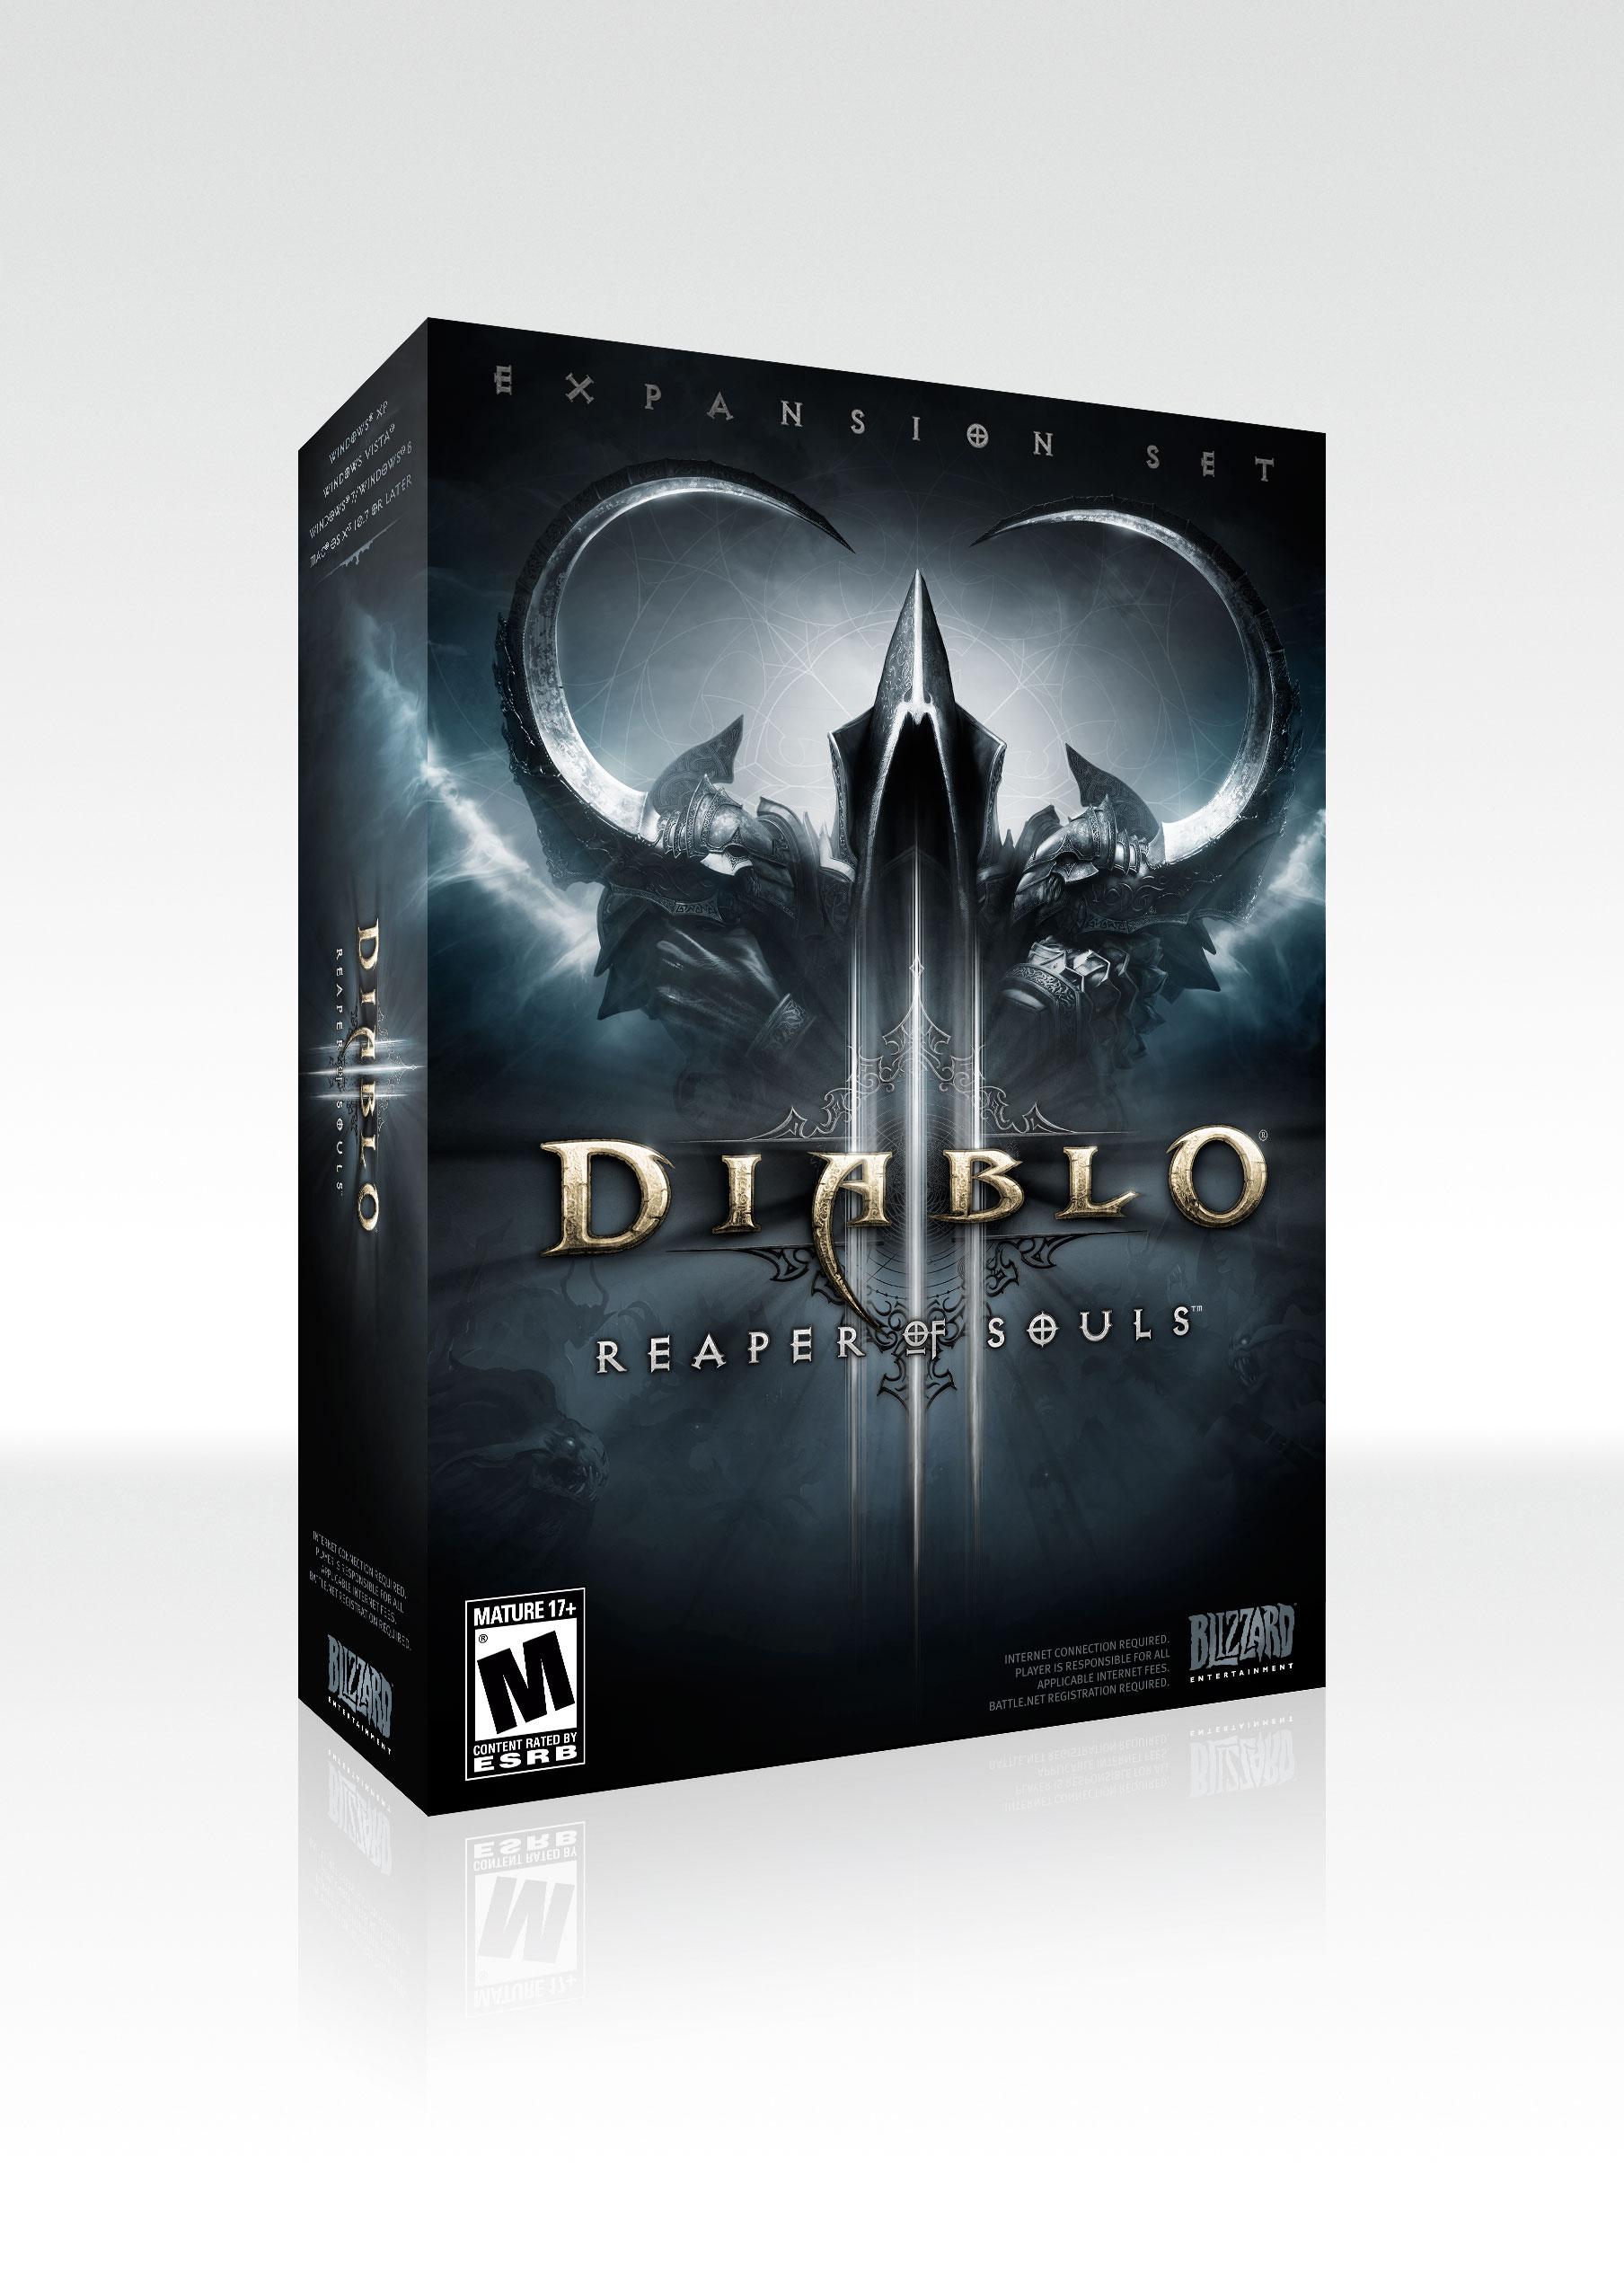 Reaper of souls nouvelle extension de Diablo III 275562793